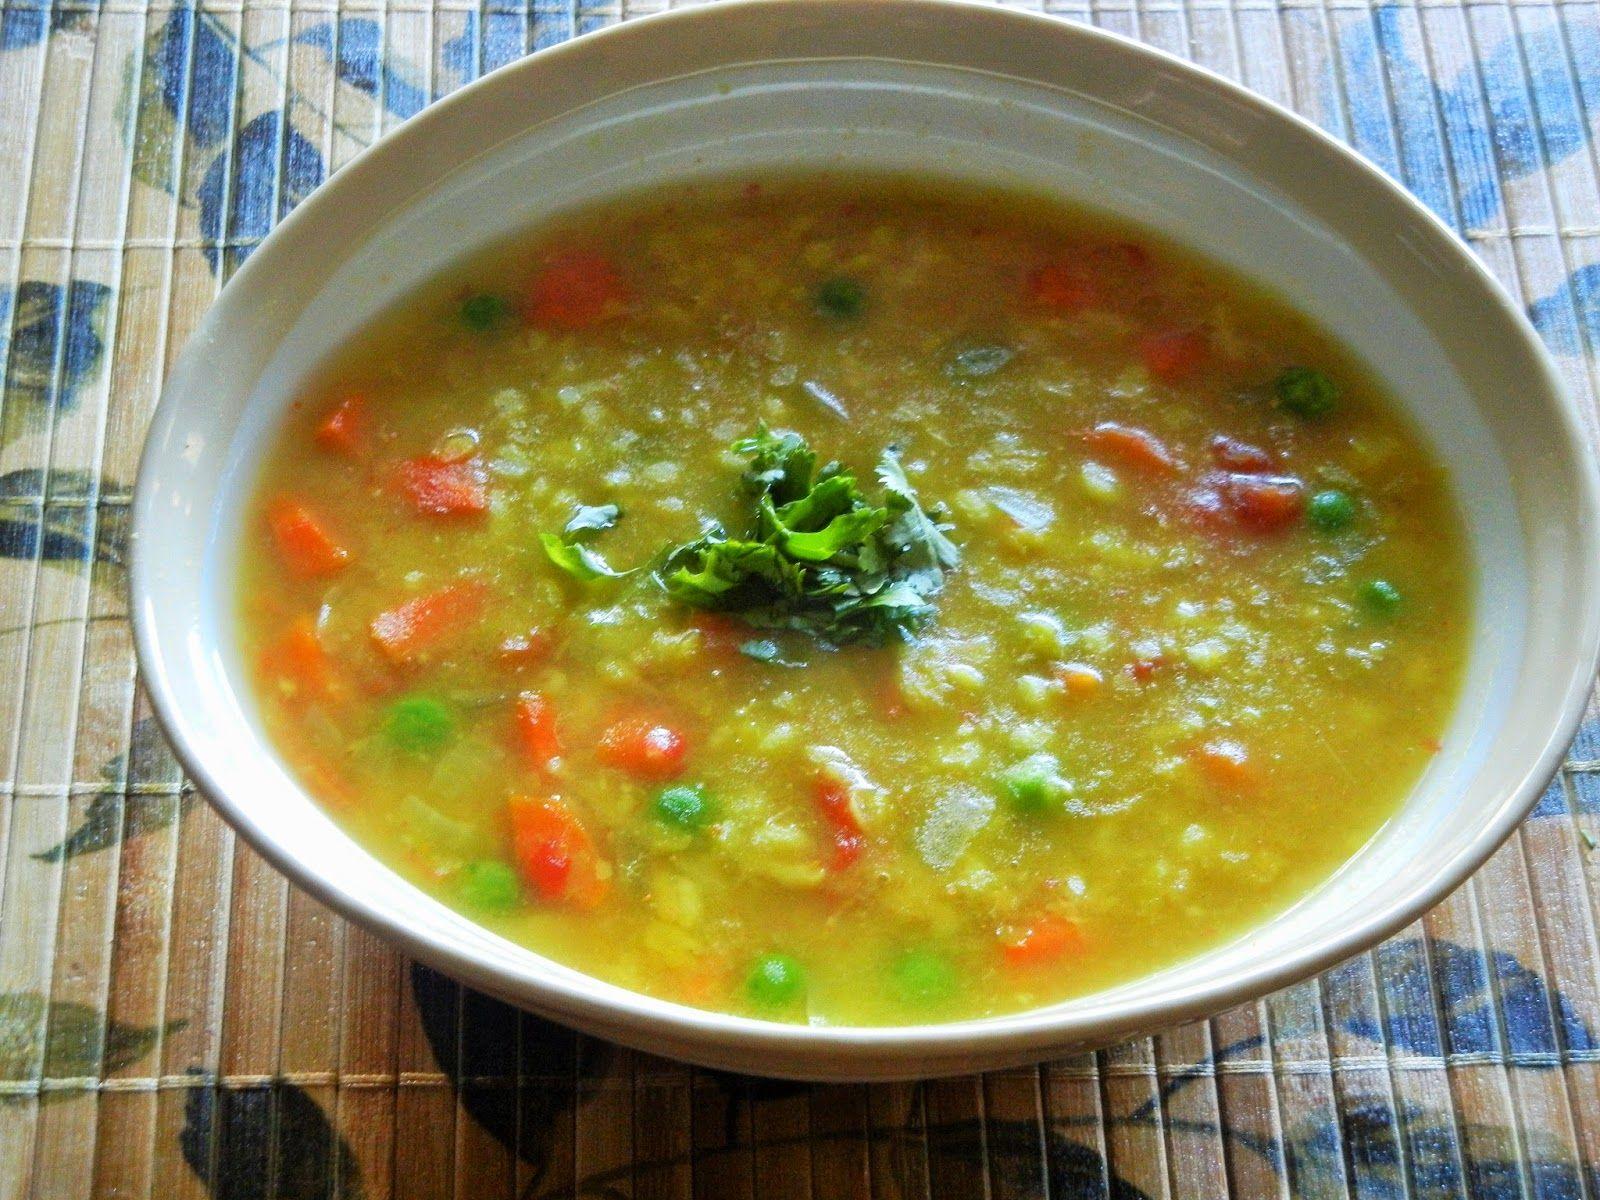 Barley and lentils vegetable soup gitas kitchen a blog for barley and lentils vegetable soup gitas kitchen a blog for indian diabetic recipes and forumfinder Image collections